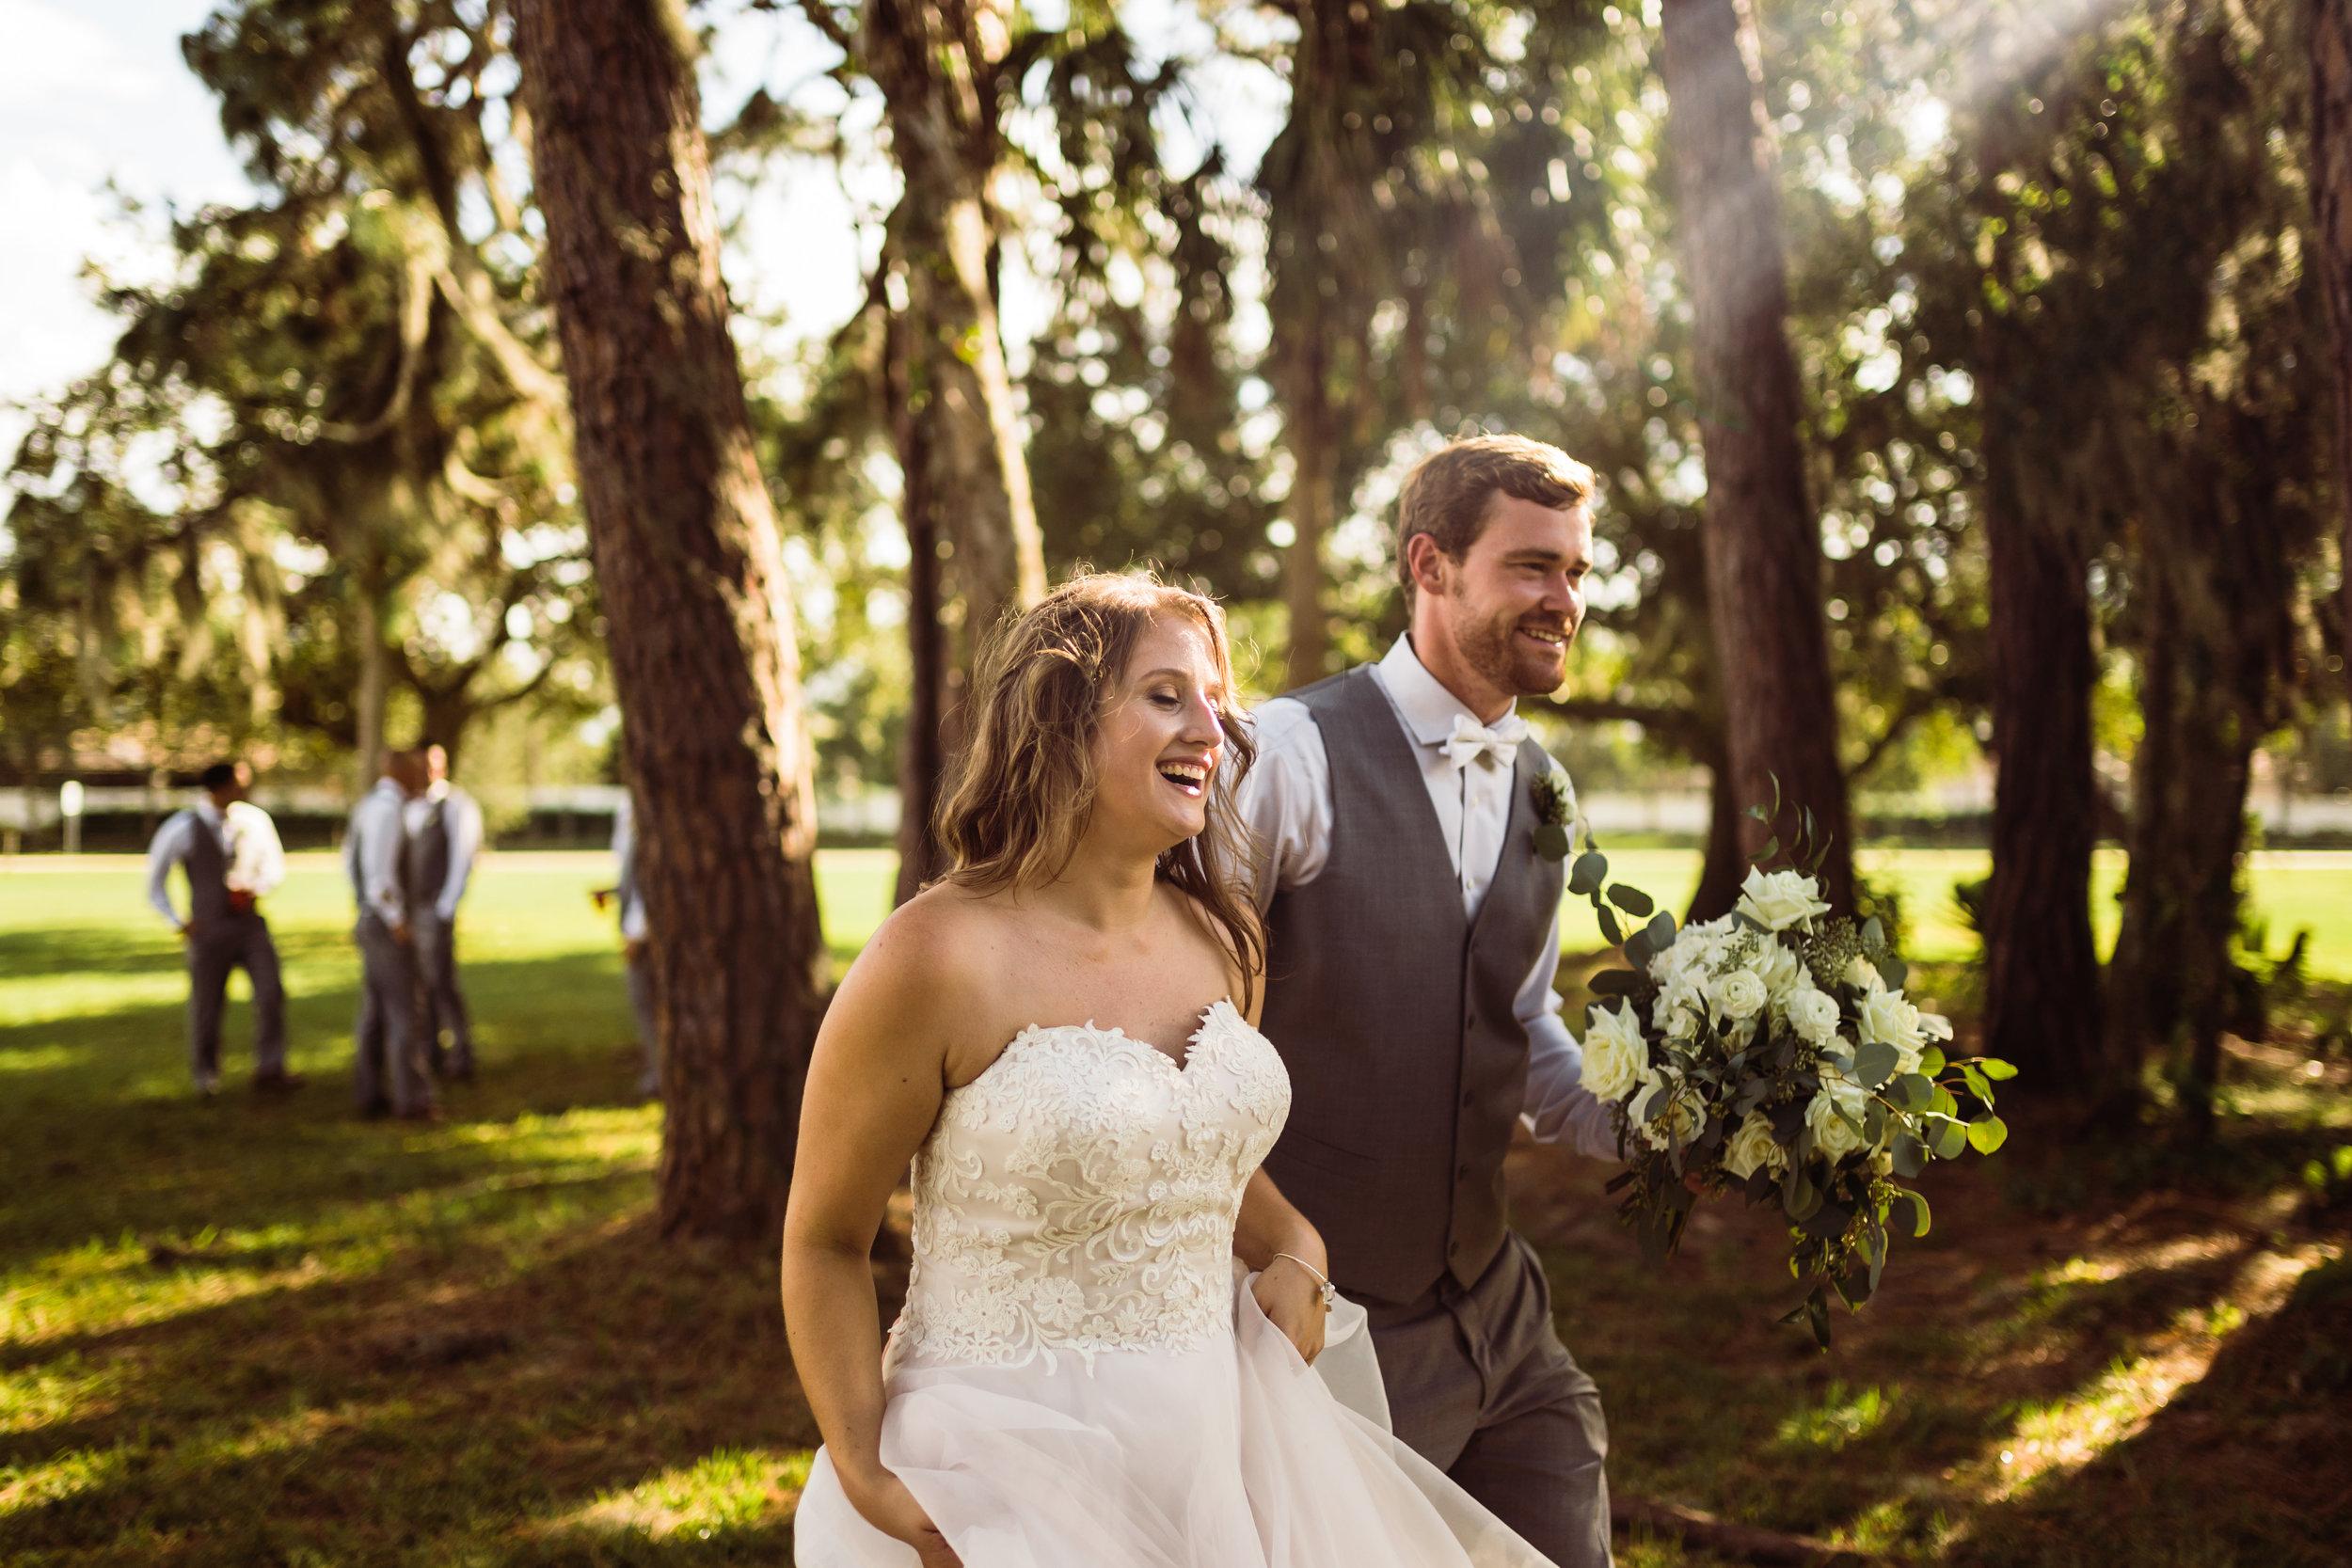 2017.10.14 Samantha and Matthew Crabtree Sarasota Wedding (317 of 708).jpg